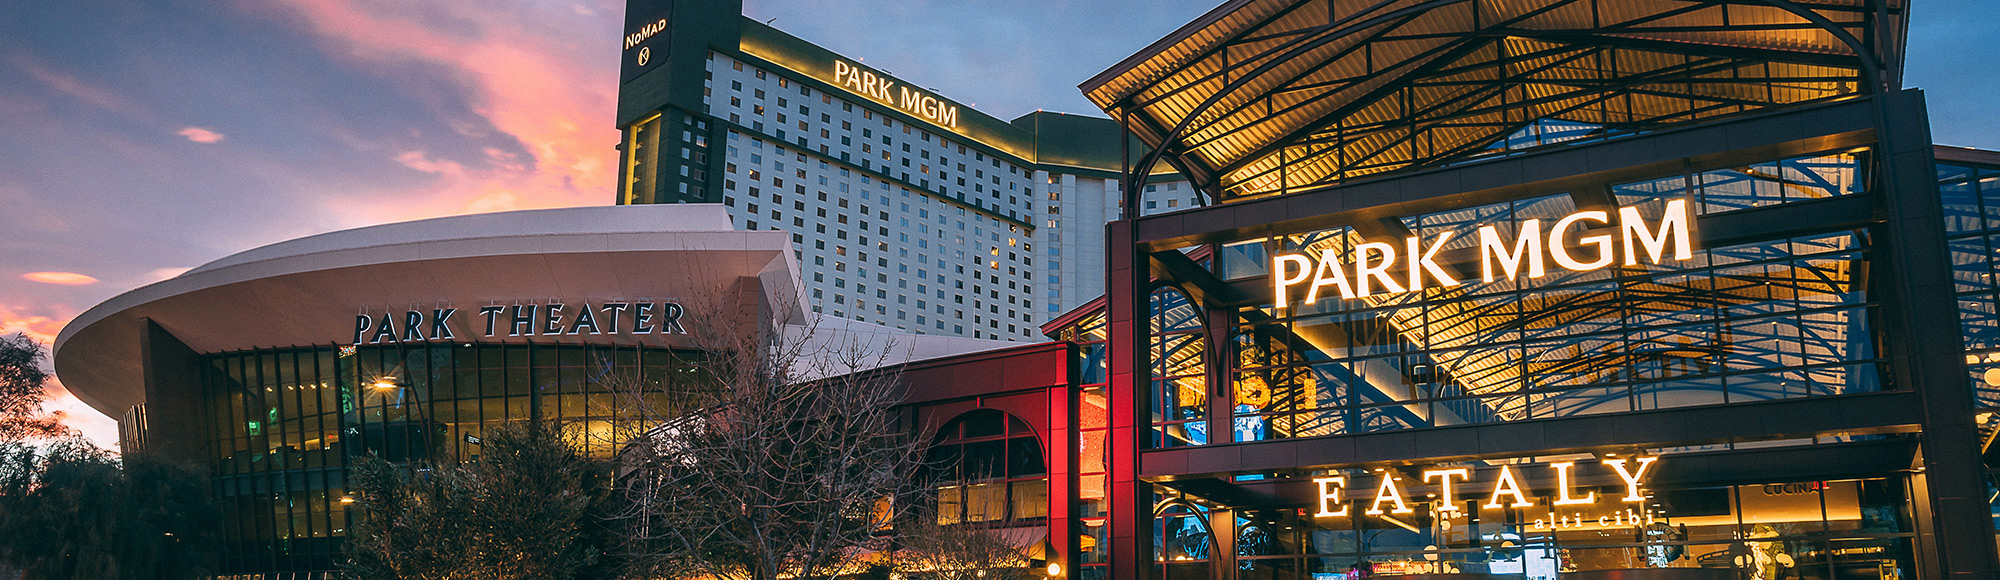 Mgm Park Las Vegas